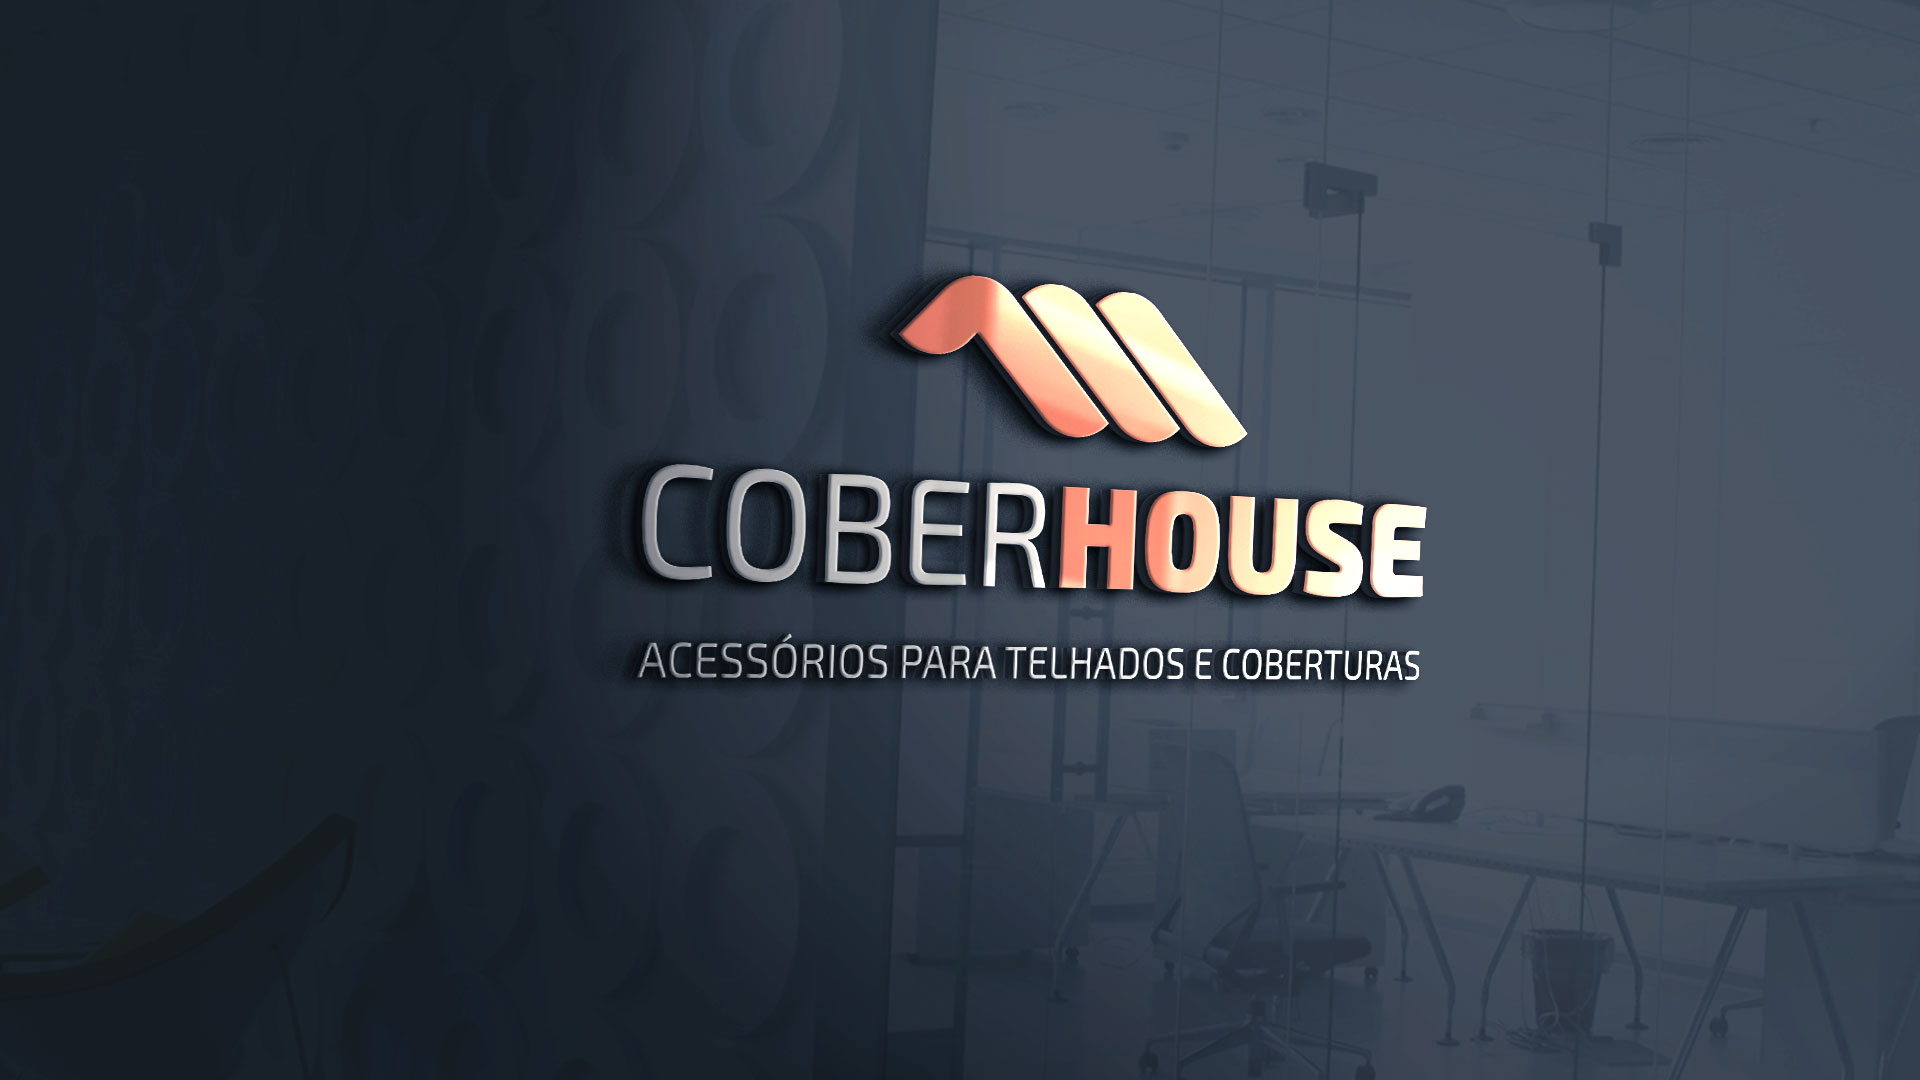 coberhouse_logo